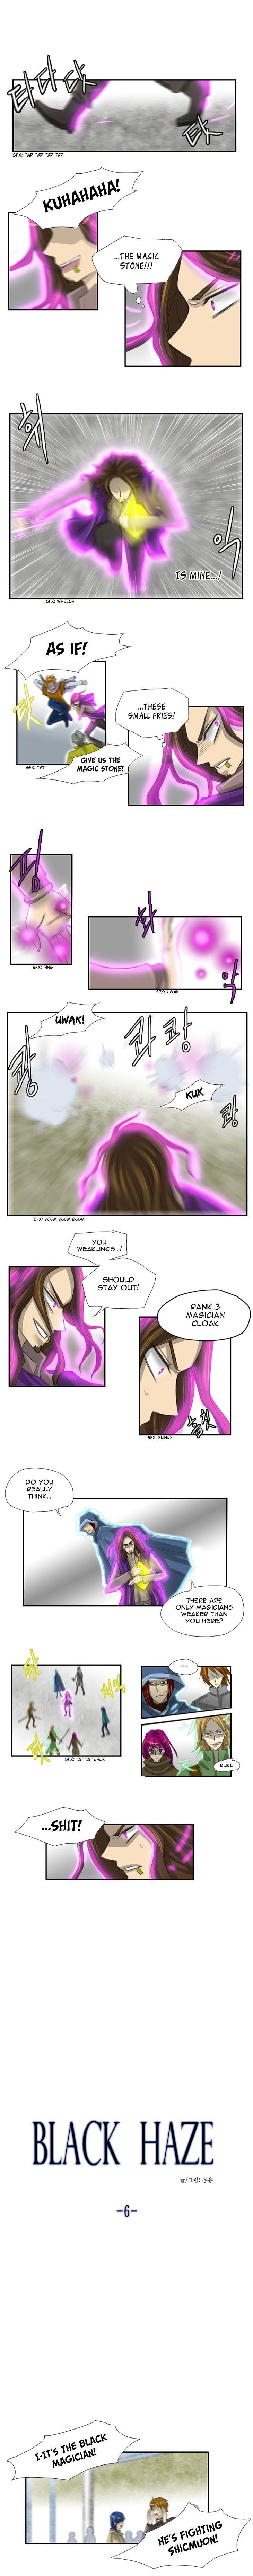 Black Haze 6 Page 1